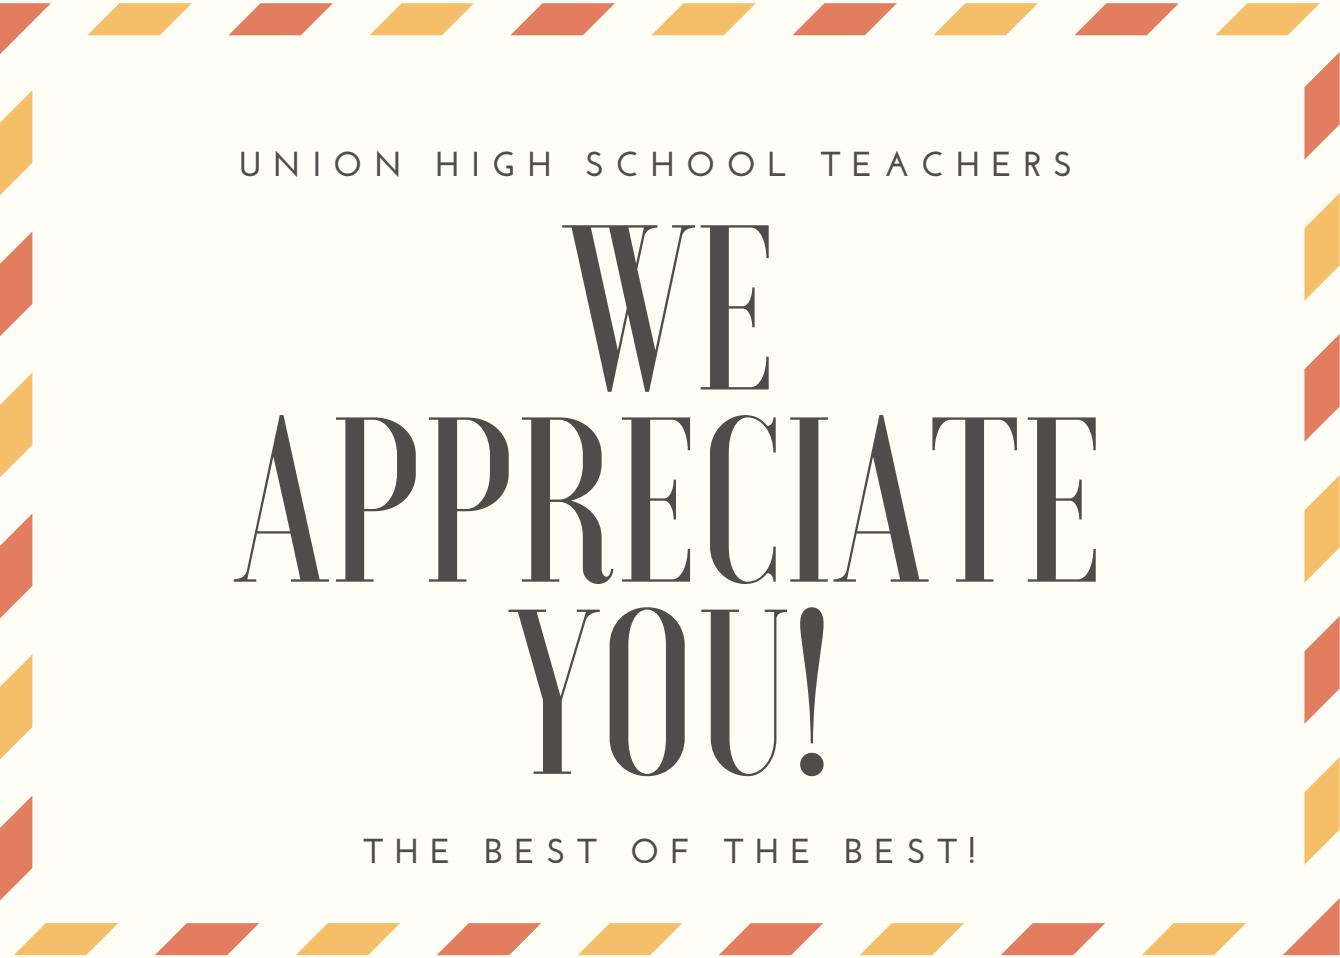 Happy National Teacher Appreciation Day! –Principal John Chargois